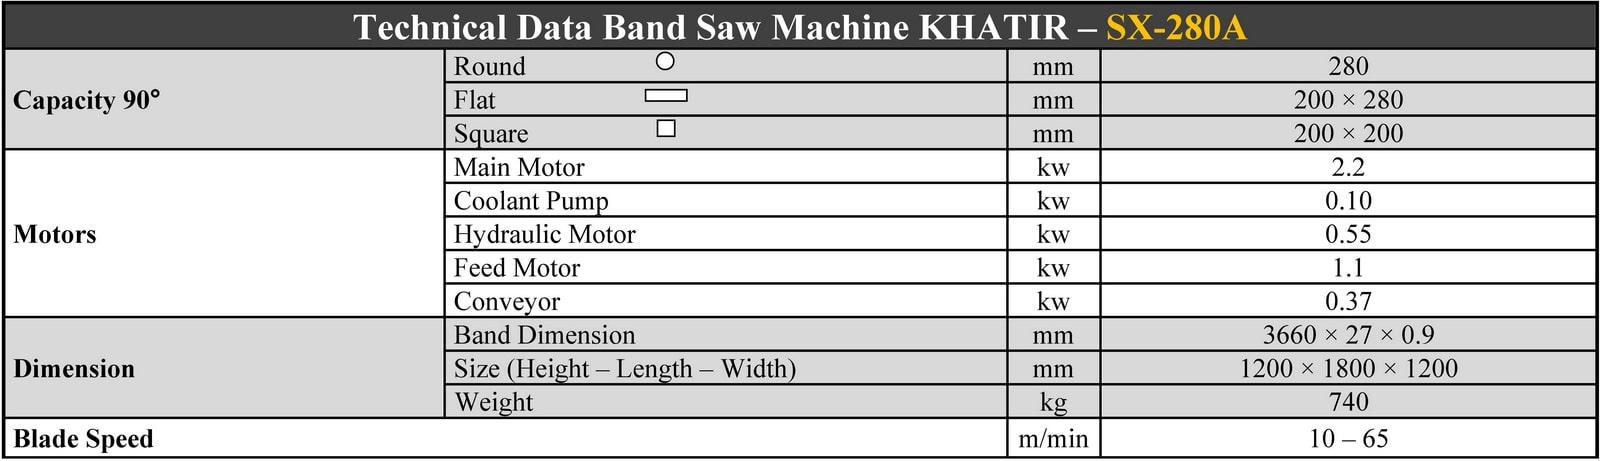 SX 280A - مشخصات فنی دستگاه اره نواری بازویی تمام اتوماتیک خطیر